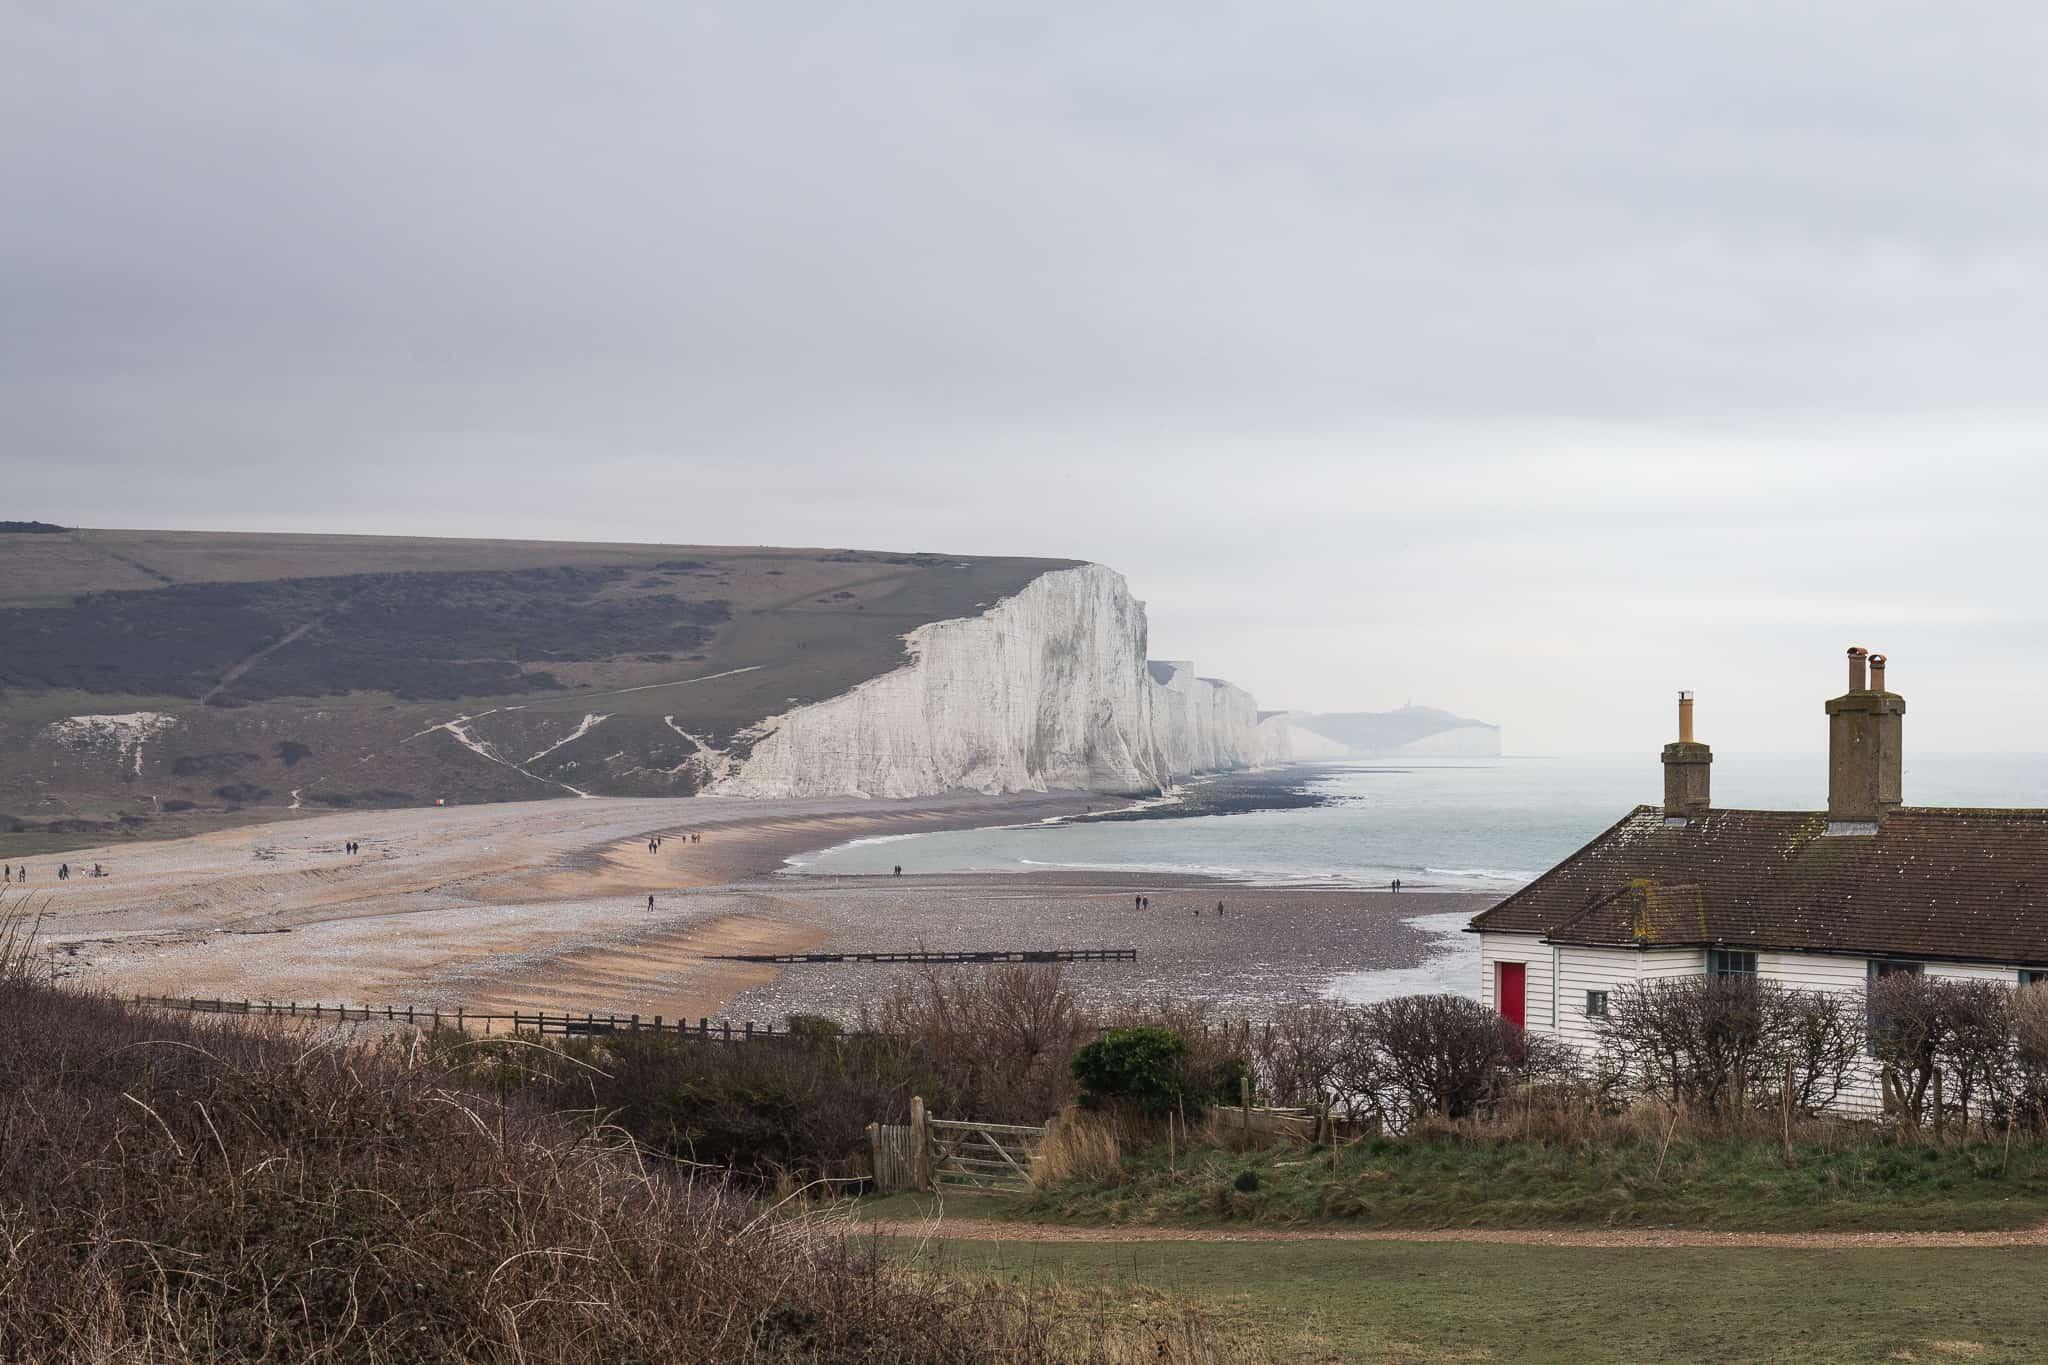 Coastguard Cottages Seven Sisters